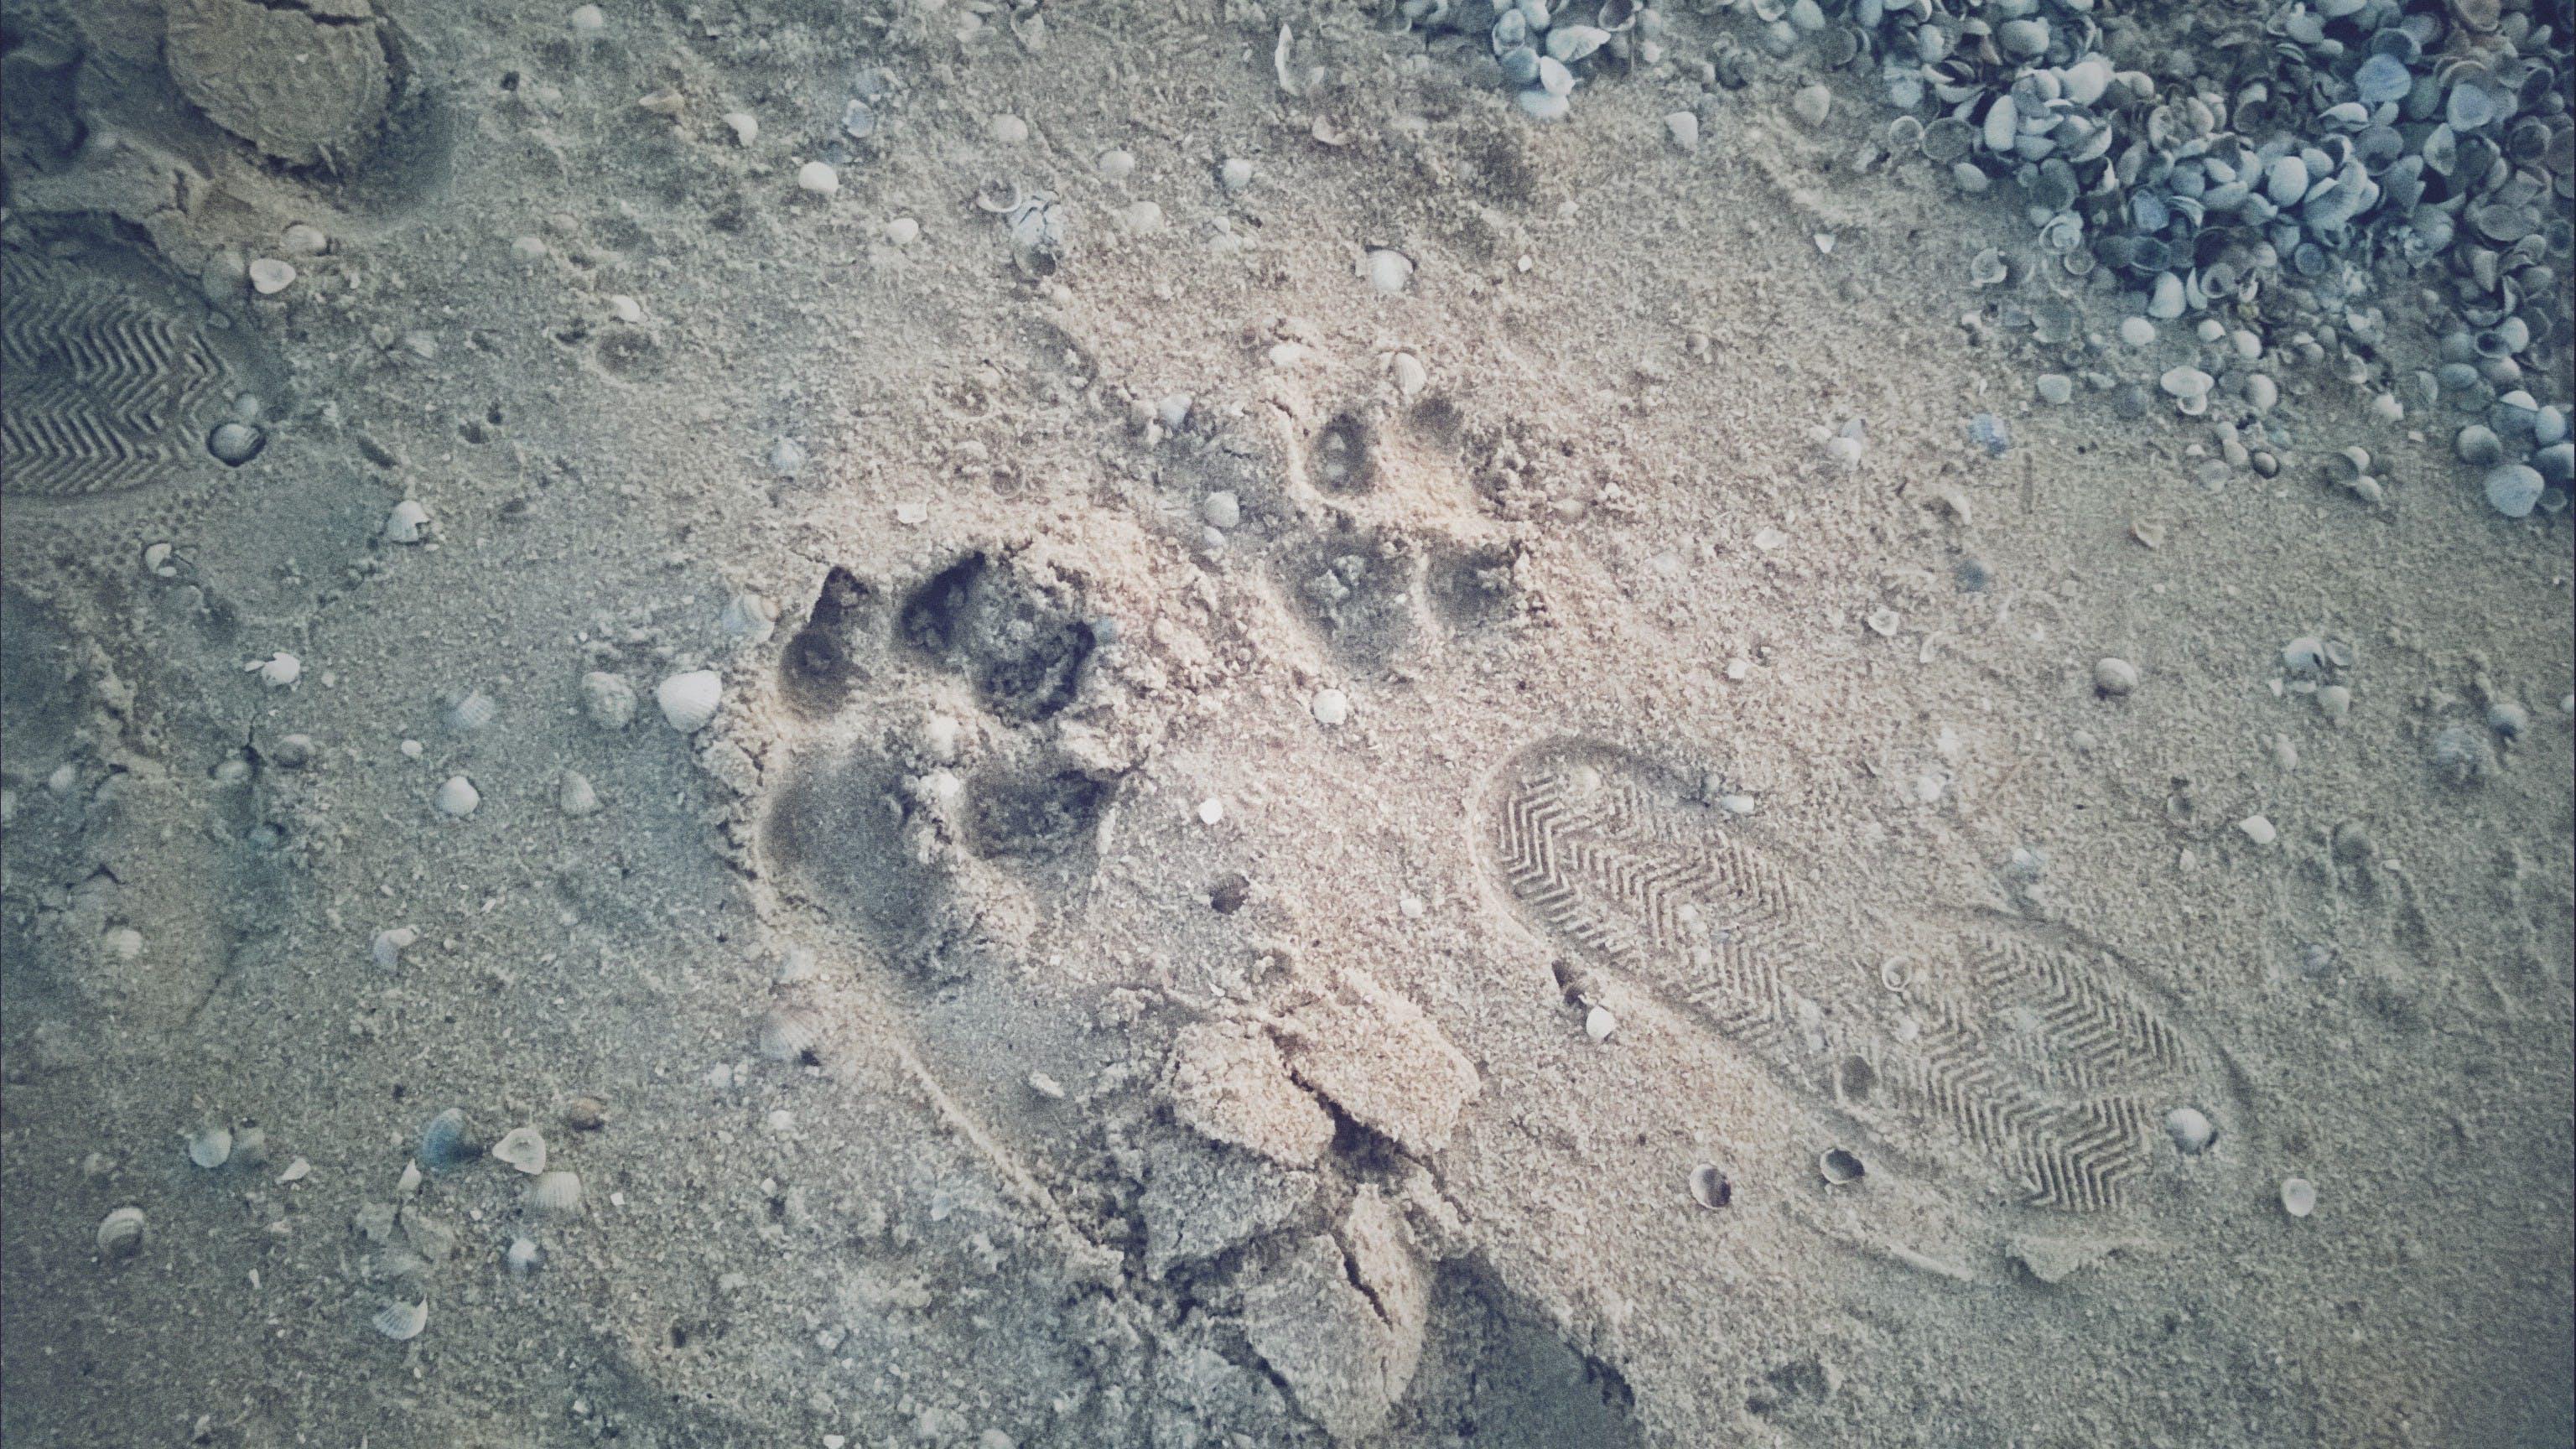 Free stock photo of beach, footprints on the sand, sea